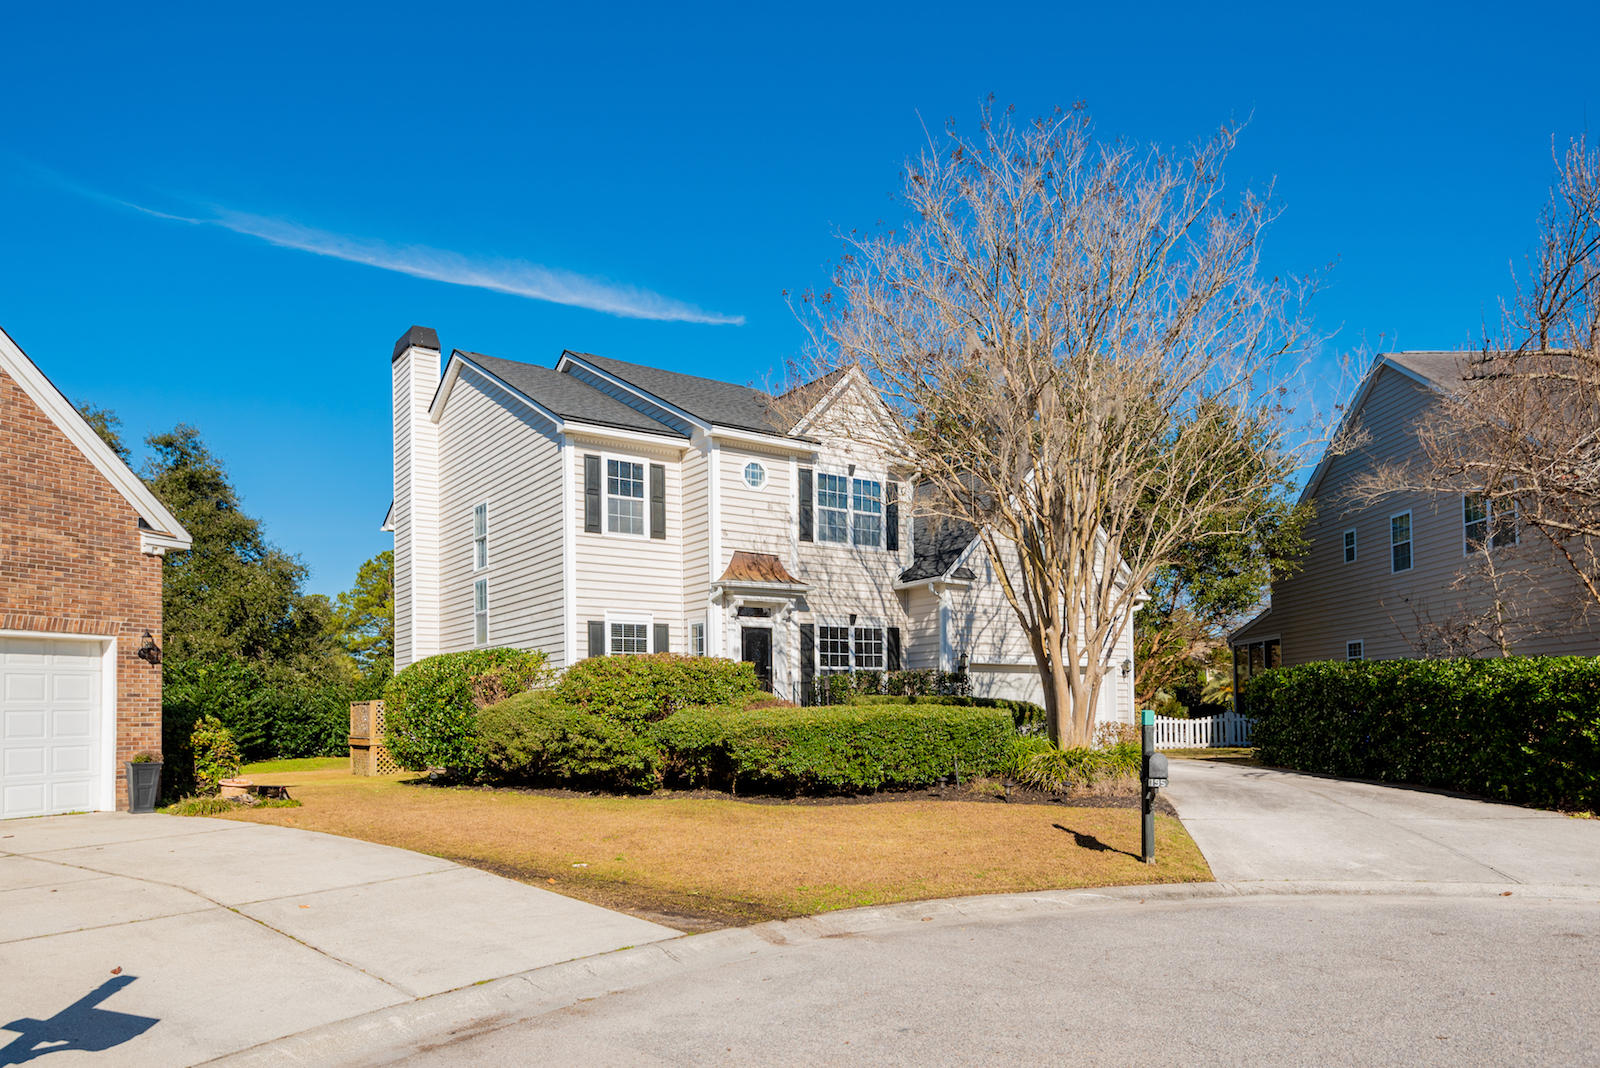 Belle Hall Homes For Sale - 195 Revetment, Mount Pleasant, SC - 25